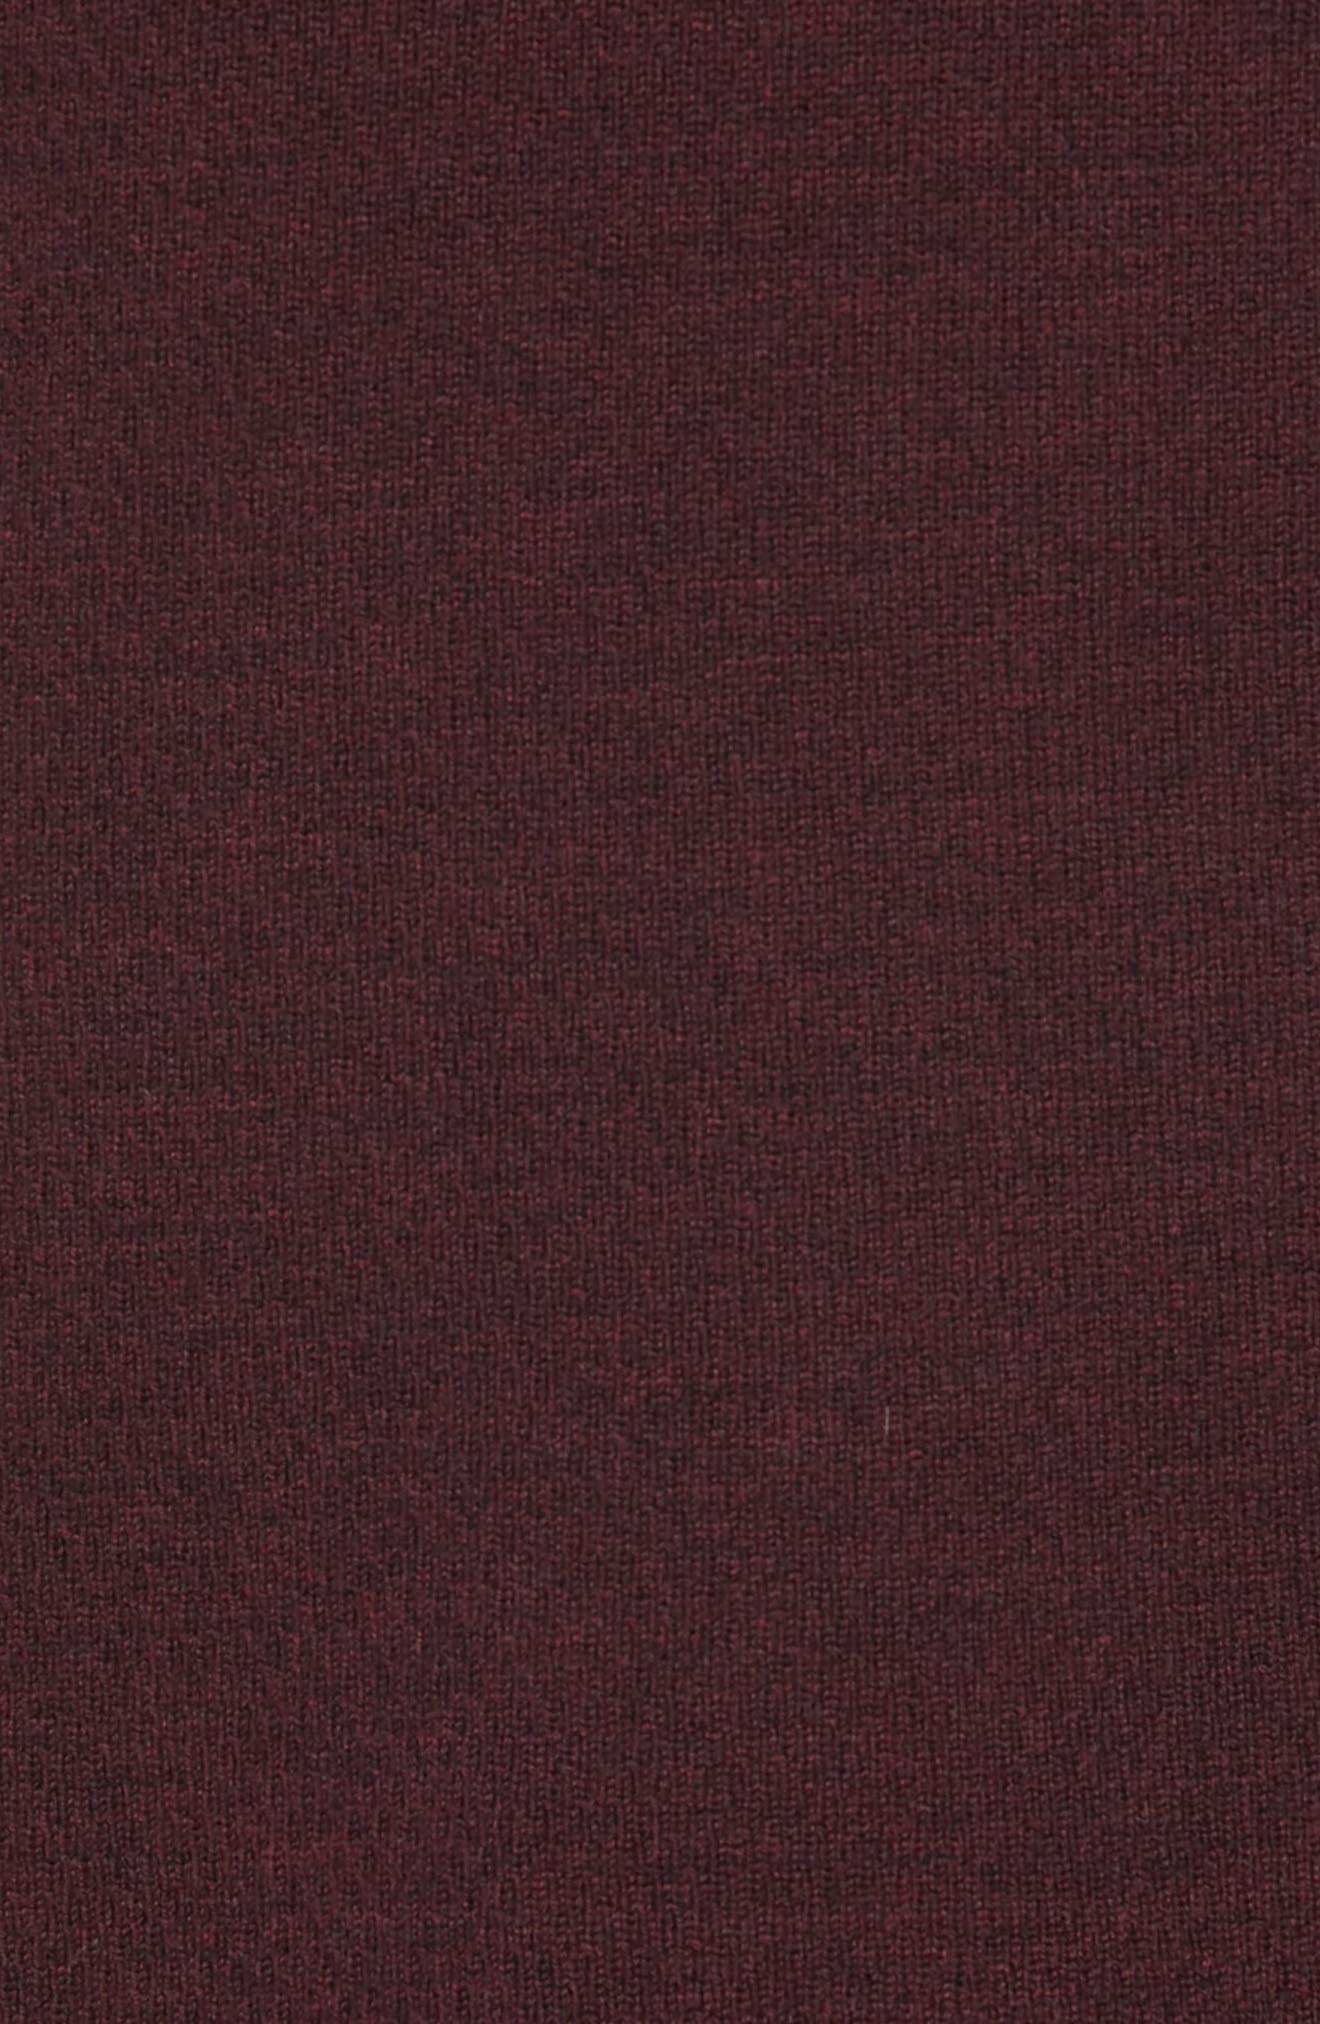 Gregory Merino Wool Blend Crewneck Sweater,                             Alternate thumbnail 5, color,                             BURGUNDY